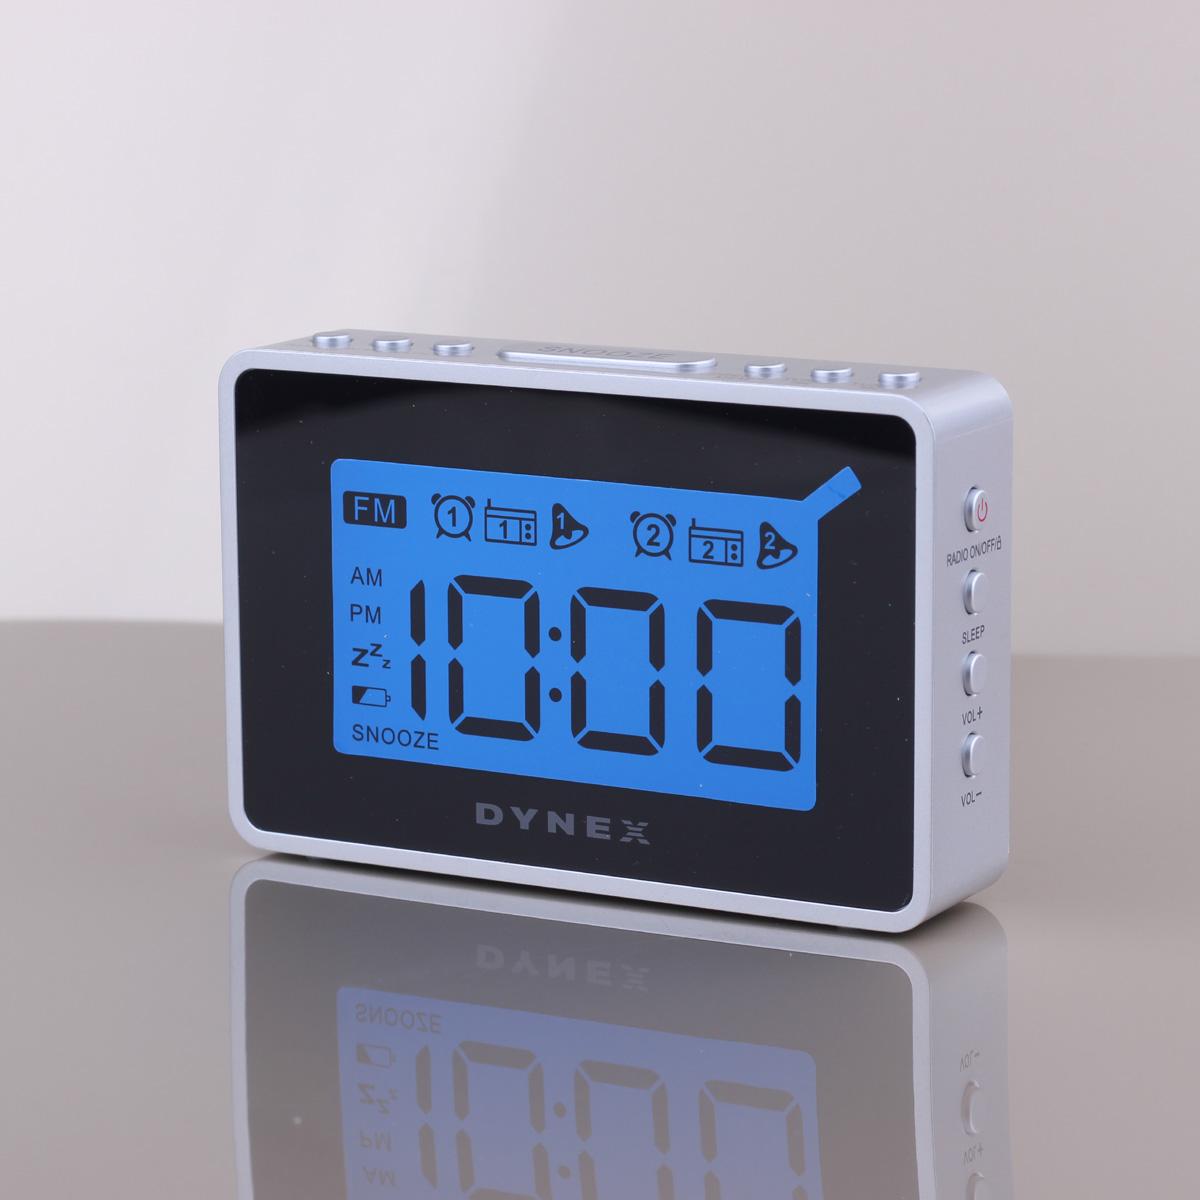 LED Digital radio alarm clock with blue backlight two groups alarm clock FM clock radio table clock thermometer radio relogio 15(China (Mainland))